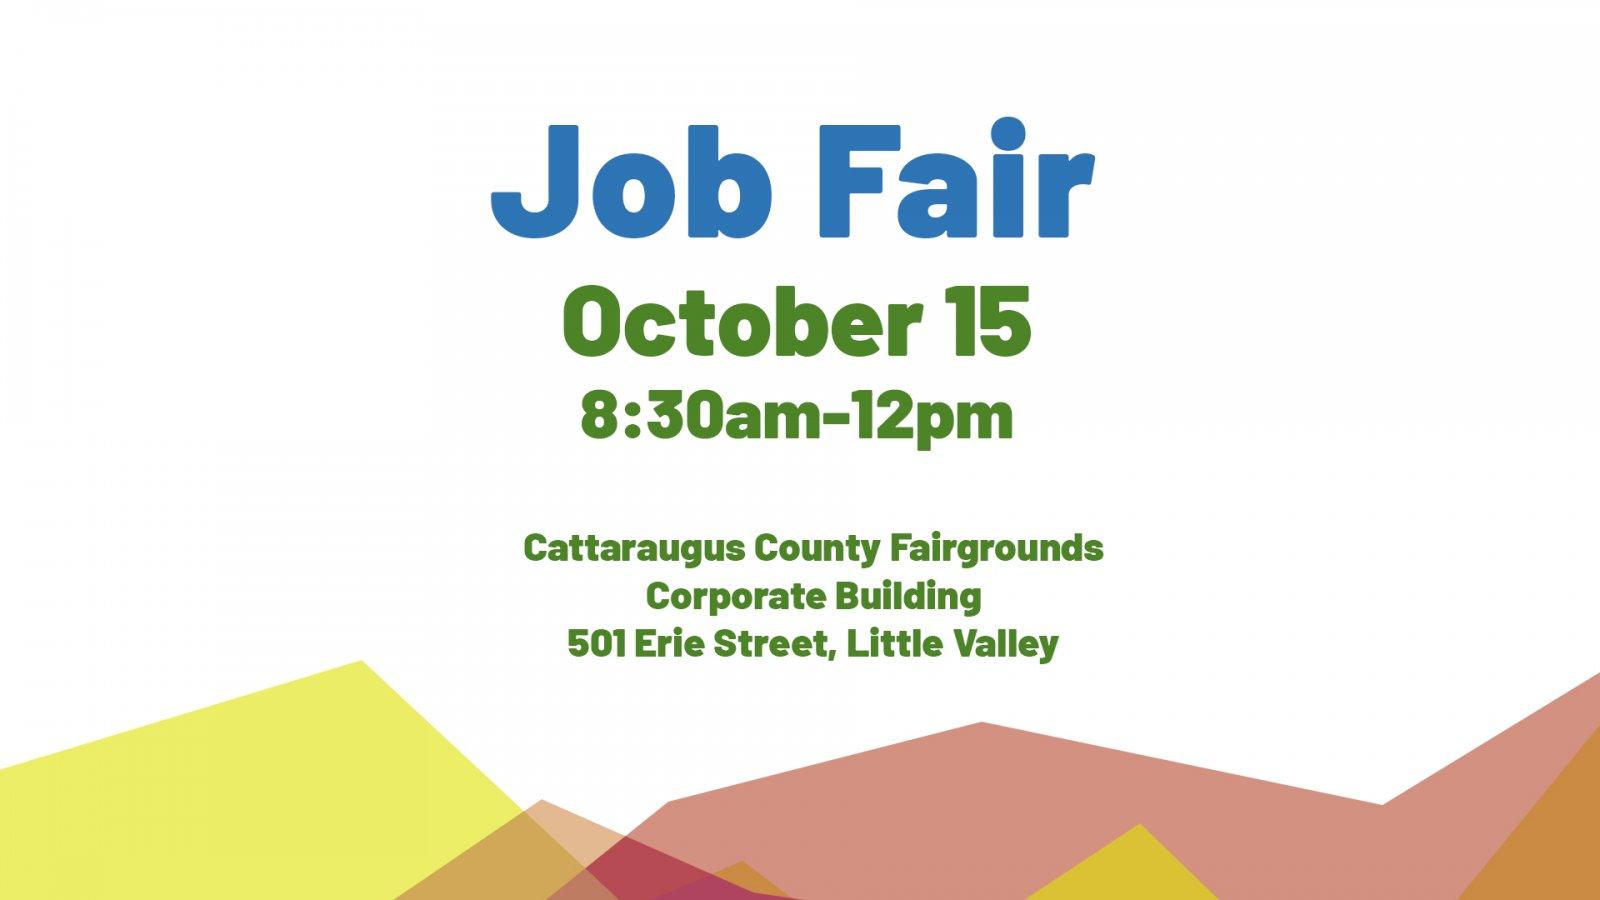 Job Fair - October 15 - 8:30am-12pm - Cattaraugus County Fairgrounds - Corporate Building Little Valley